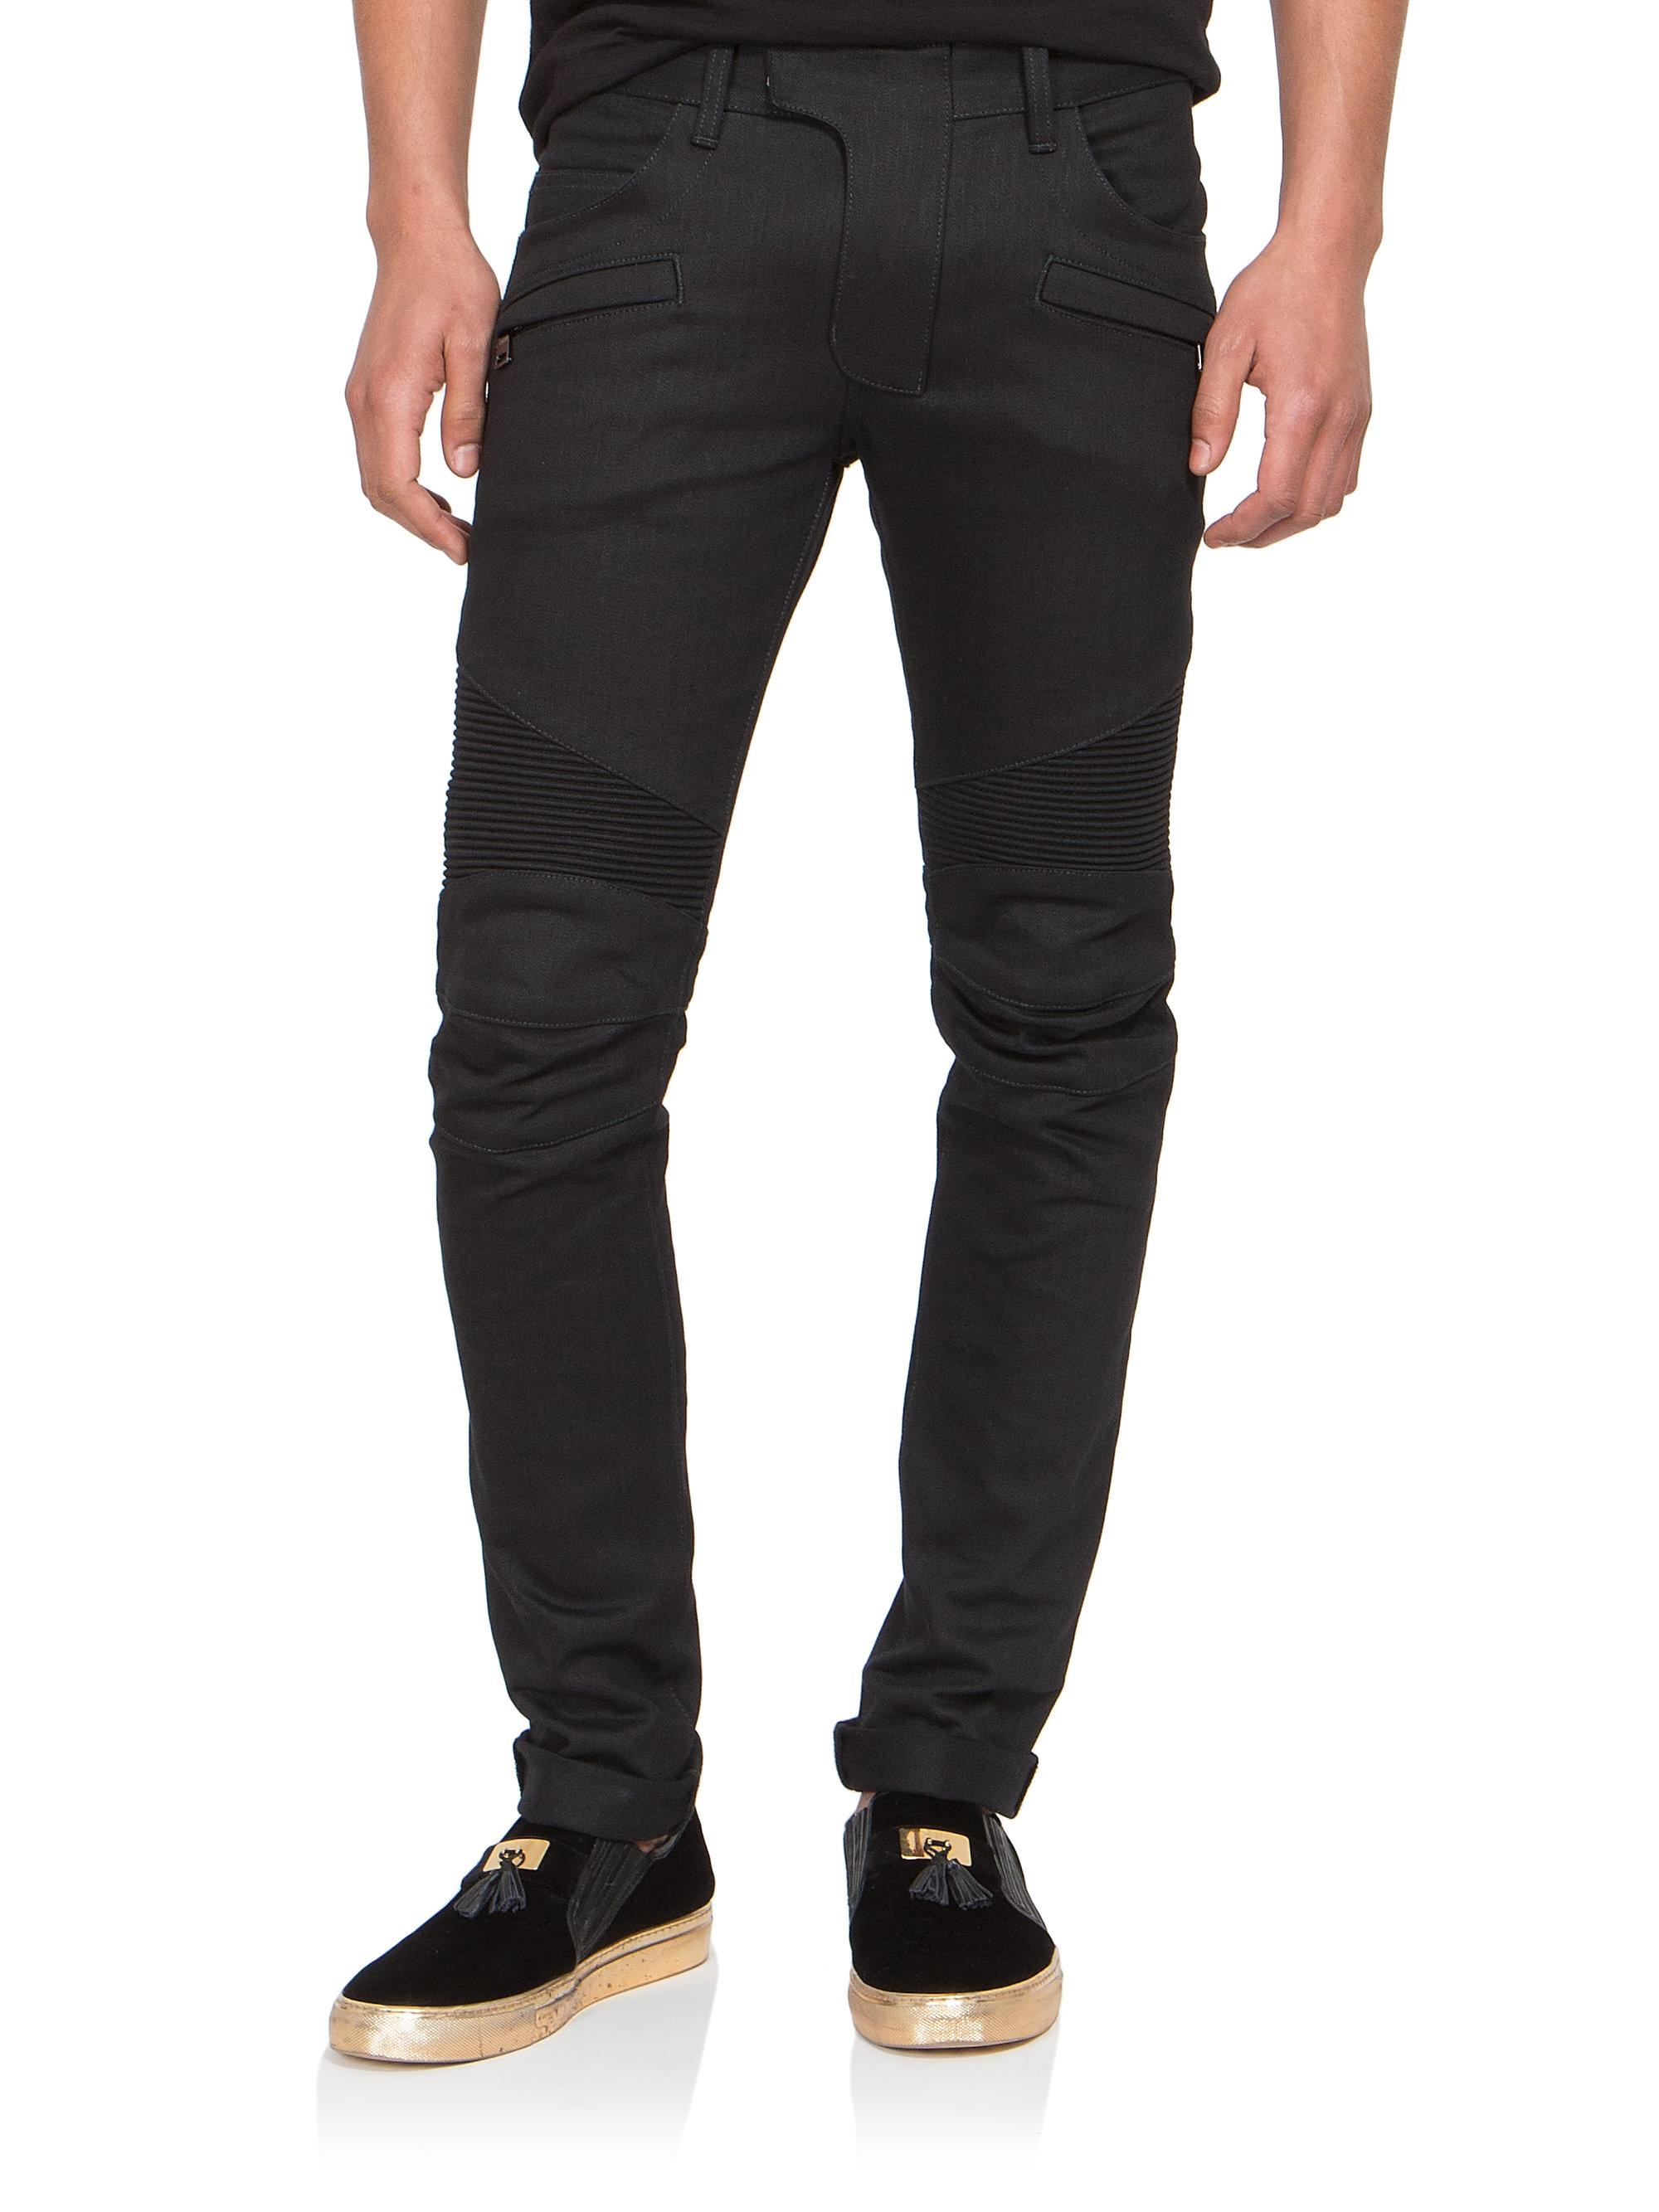 balmain slim fit raw denim moto jeans in black for men lyst. Black Bedroom Furniture Sets. Home Design Ideas